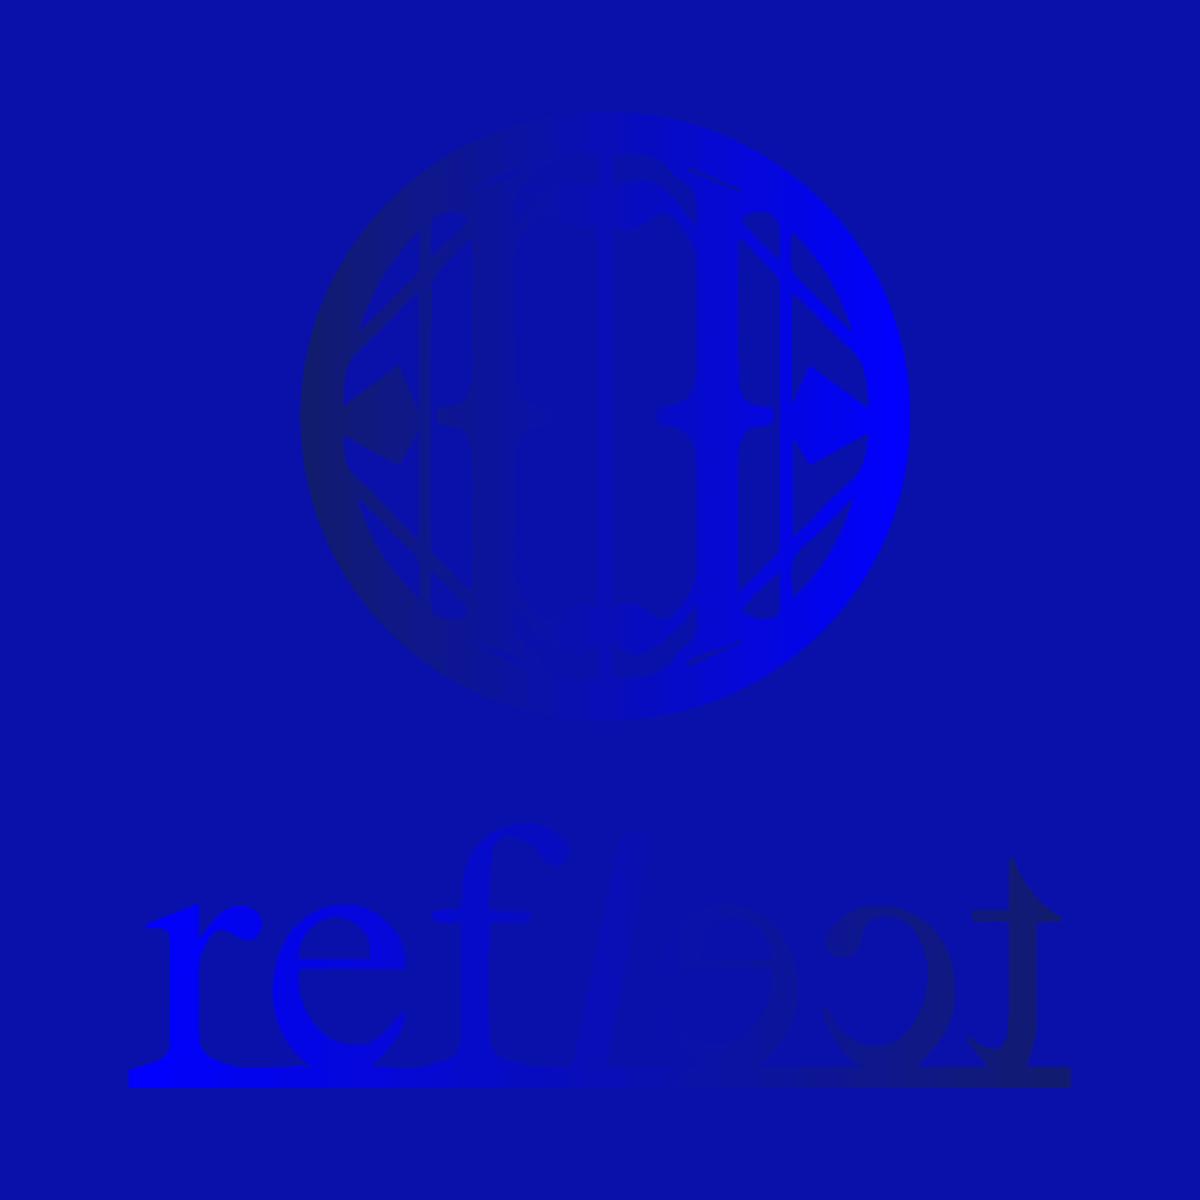 hazelyap.com_logo5